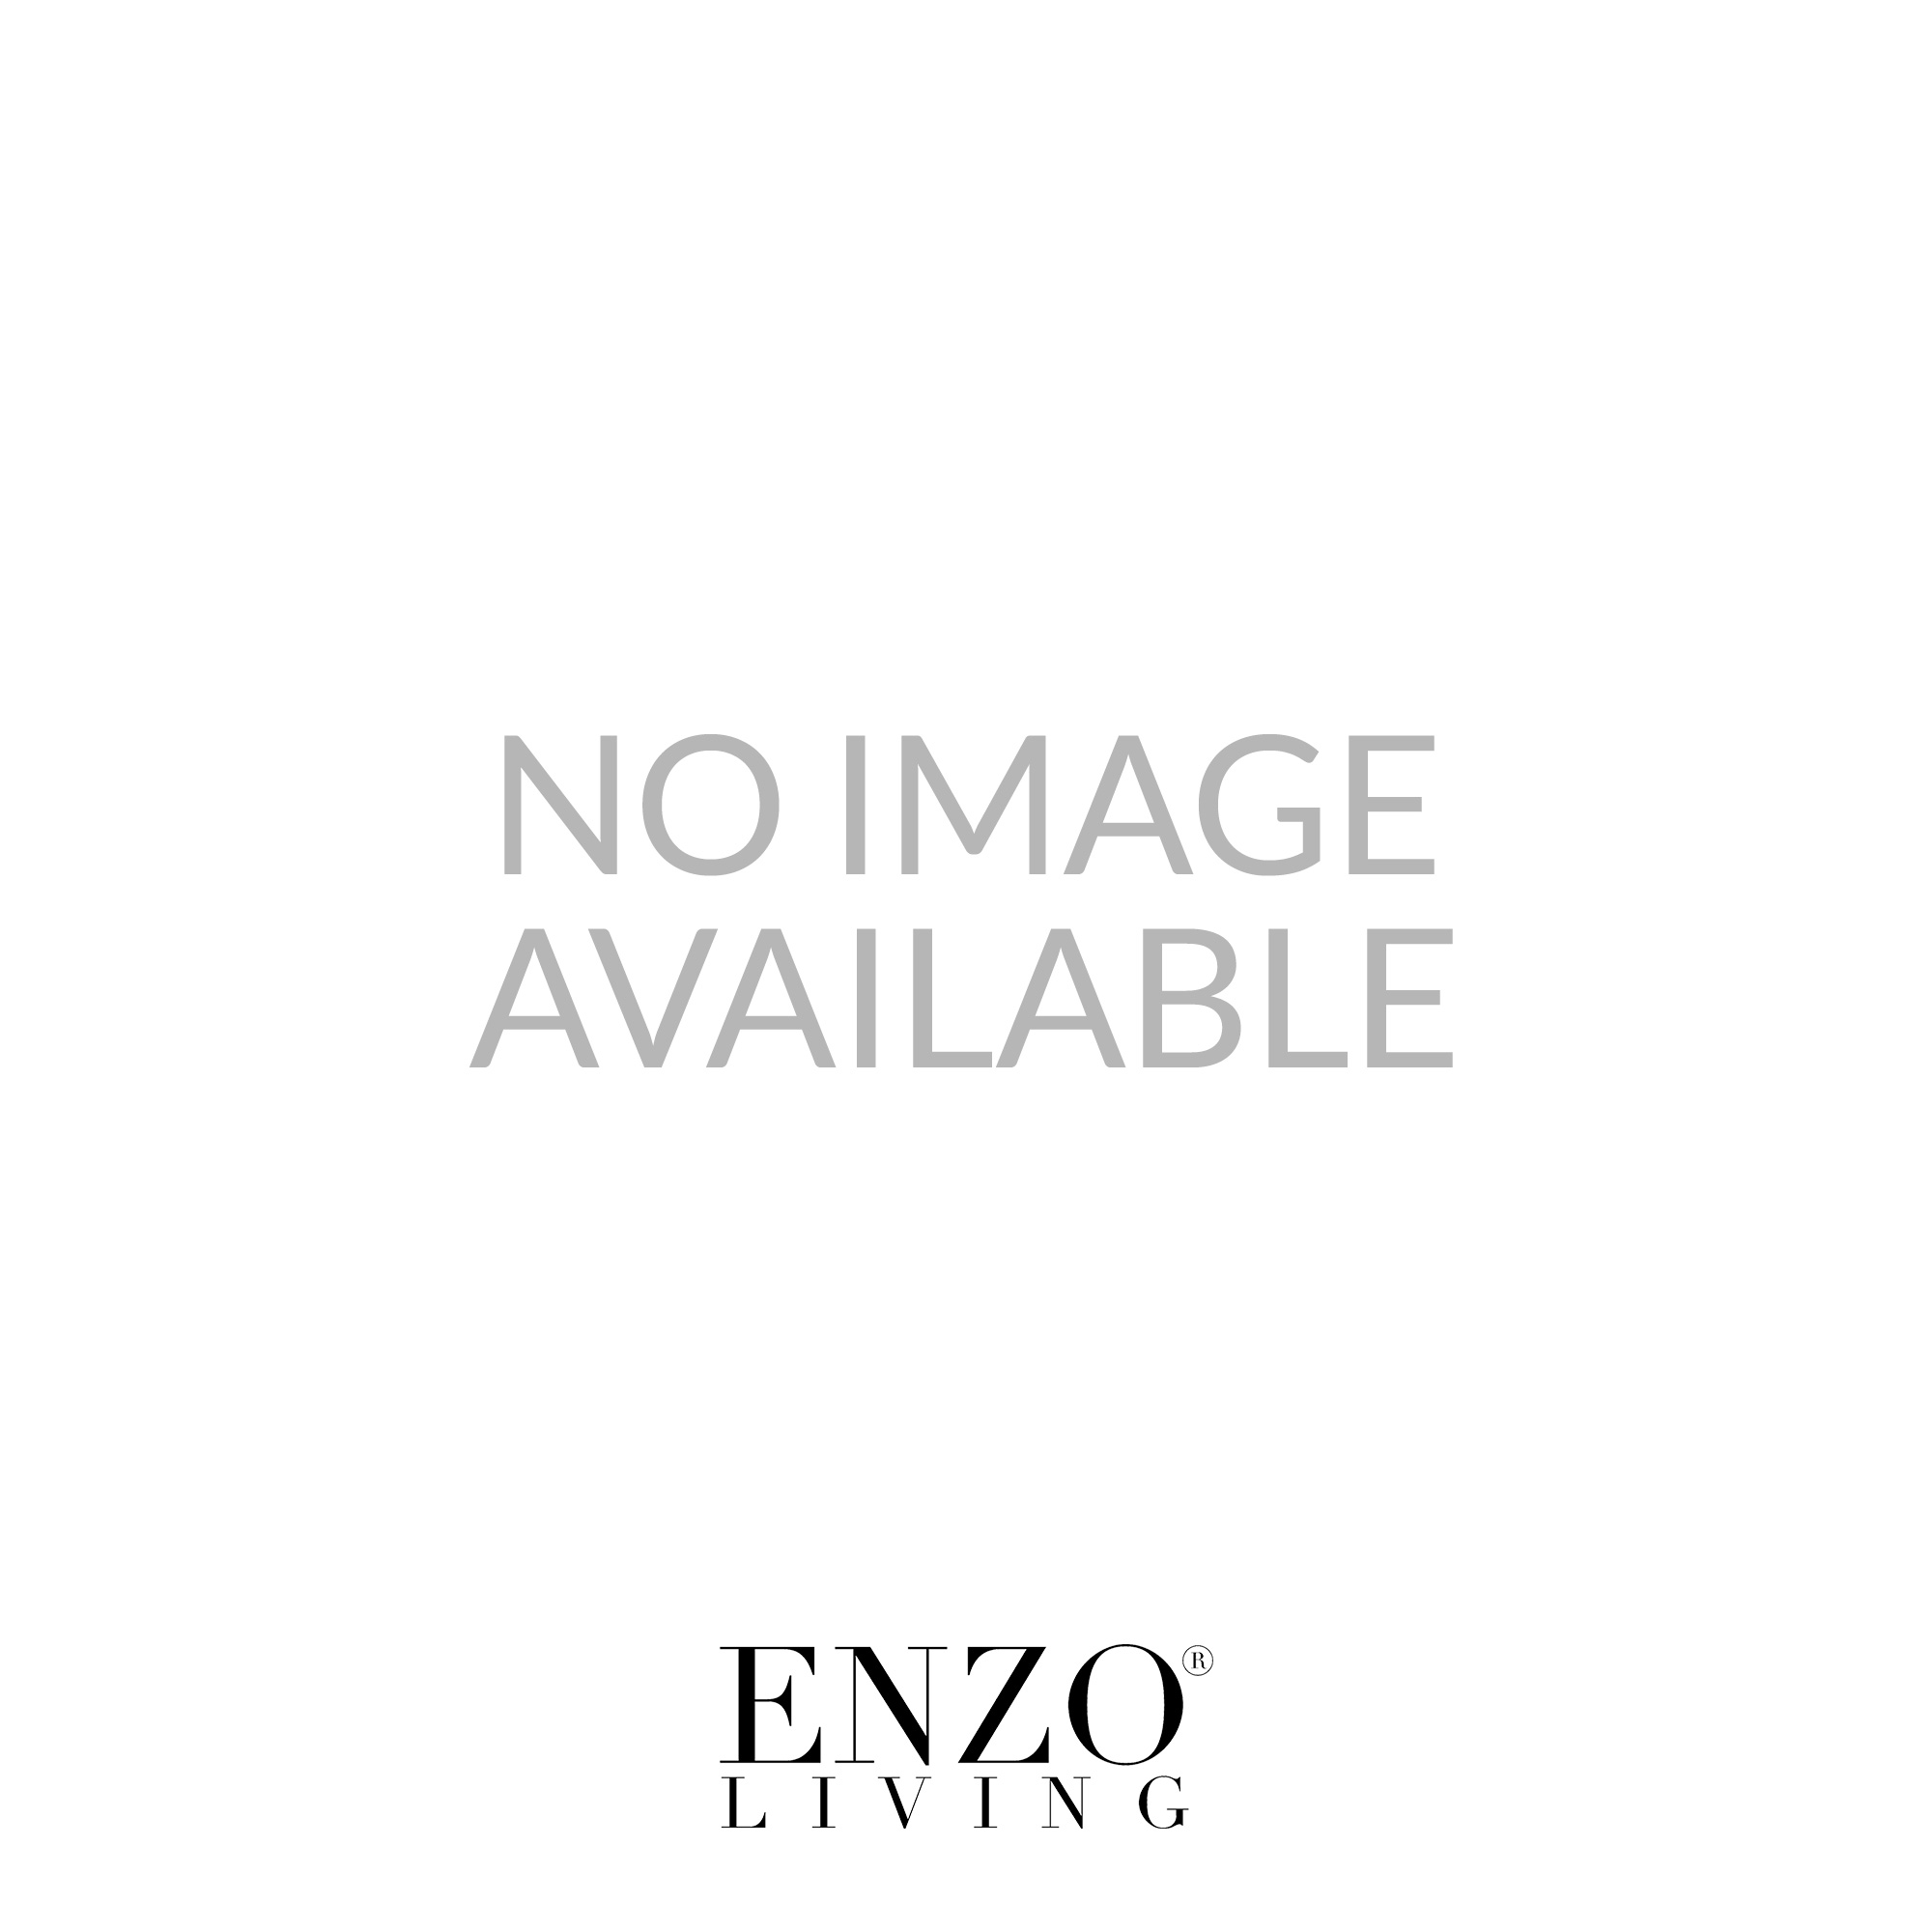 Dar BUR0650 Bureau 6 light modern ceiling light flush fitting polished chrome finish with opal glass shades